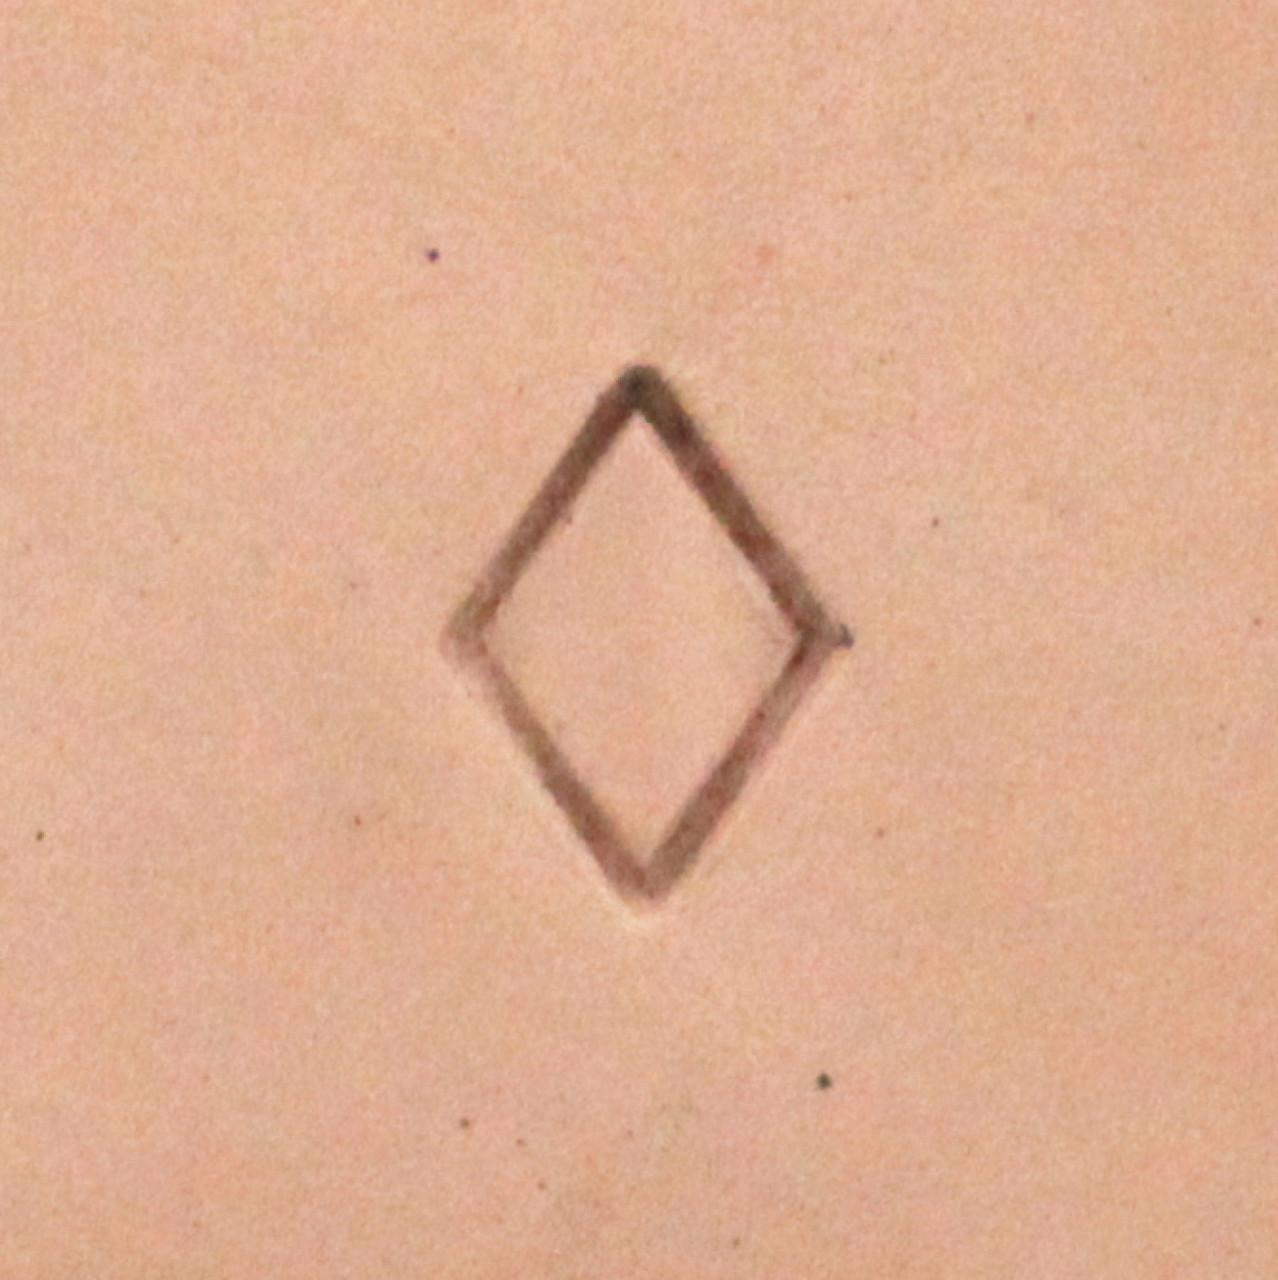 Diamond Geometric Stamp Tool S722 Impression